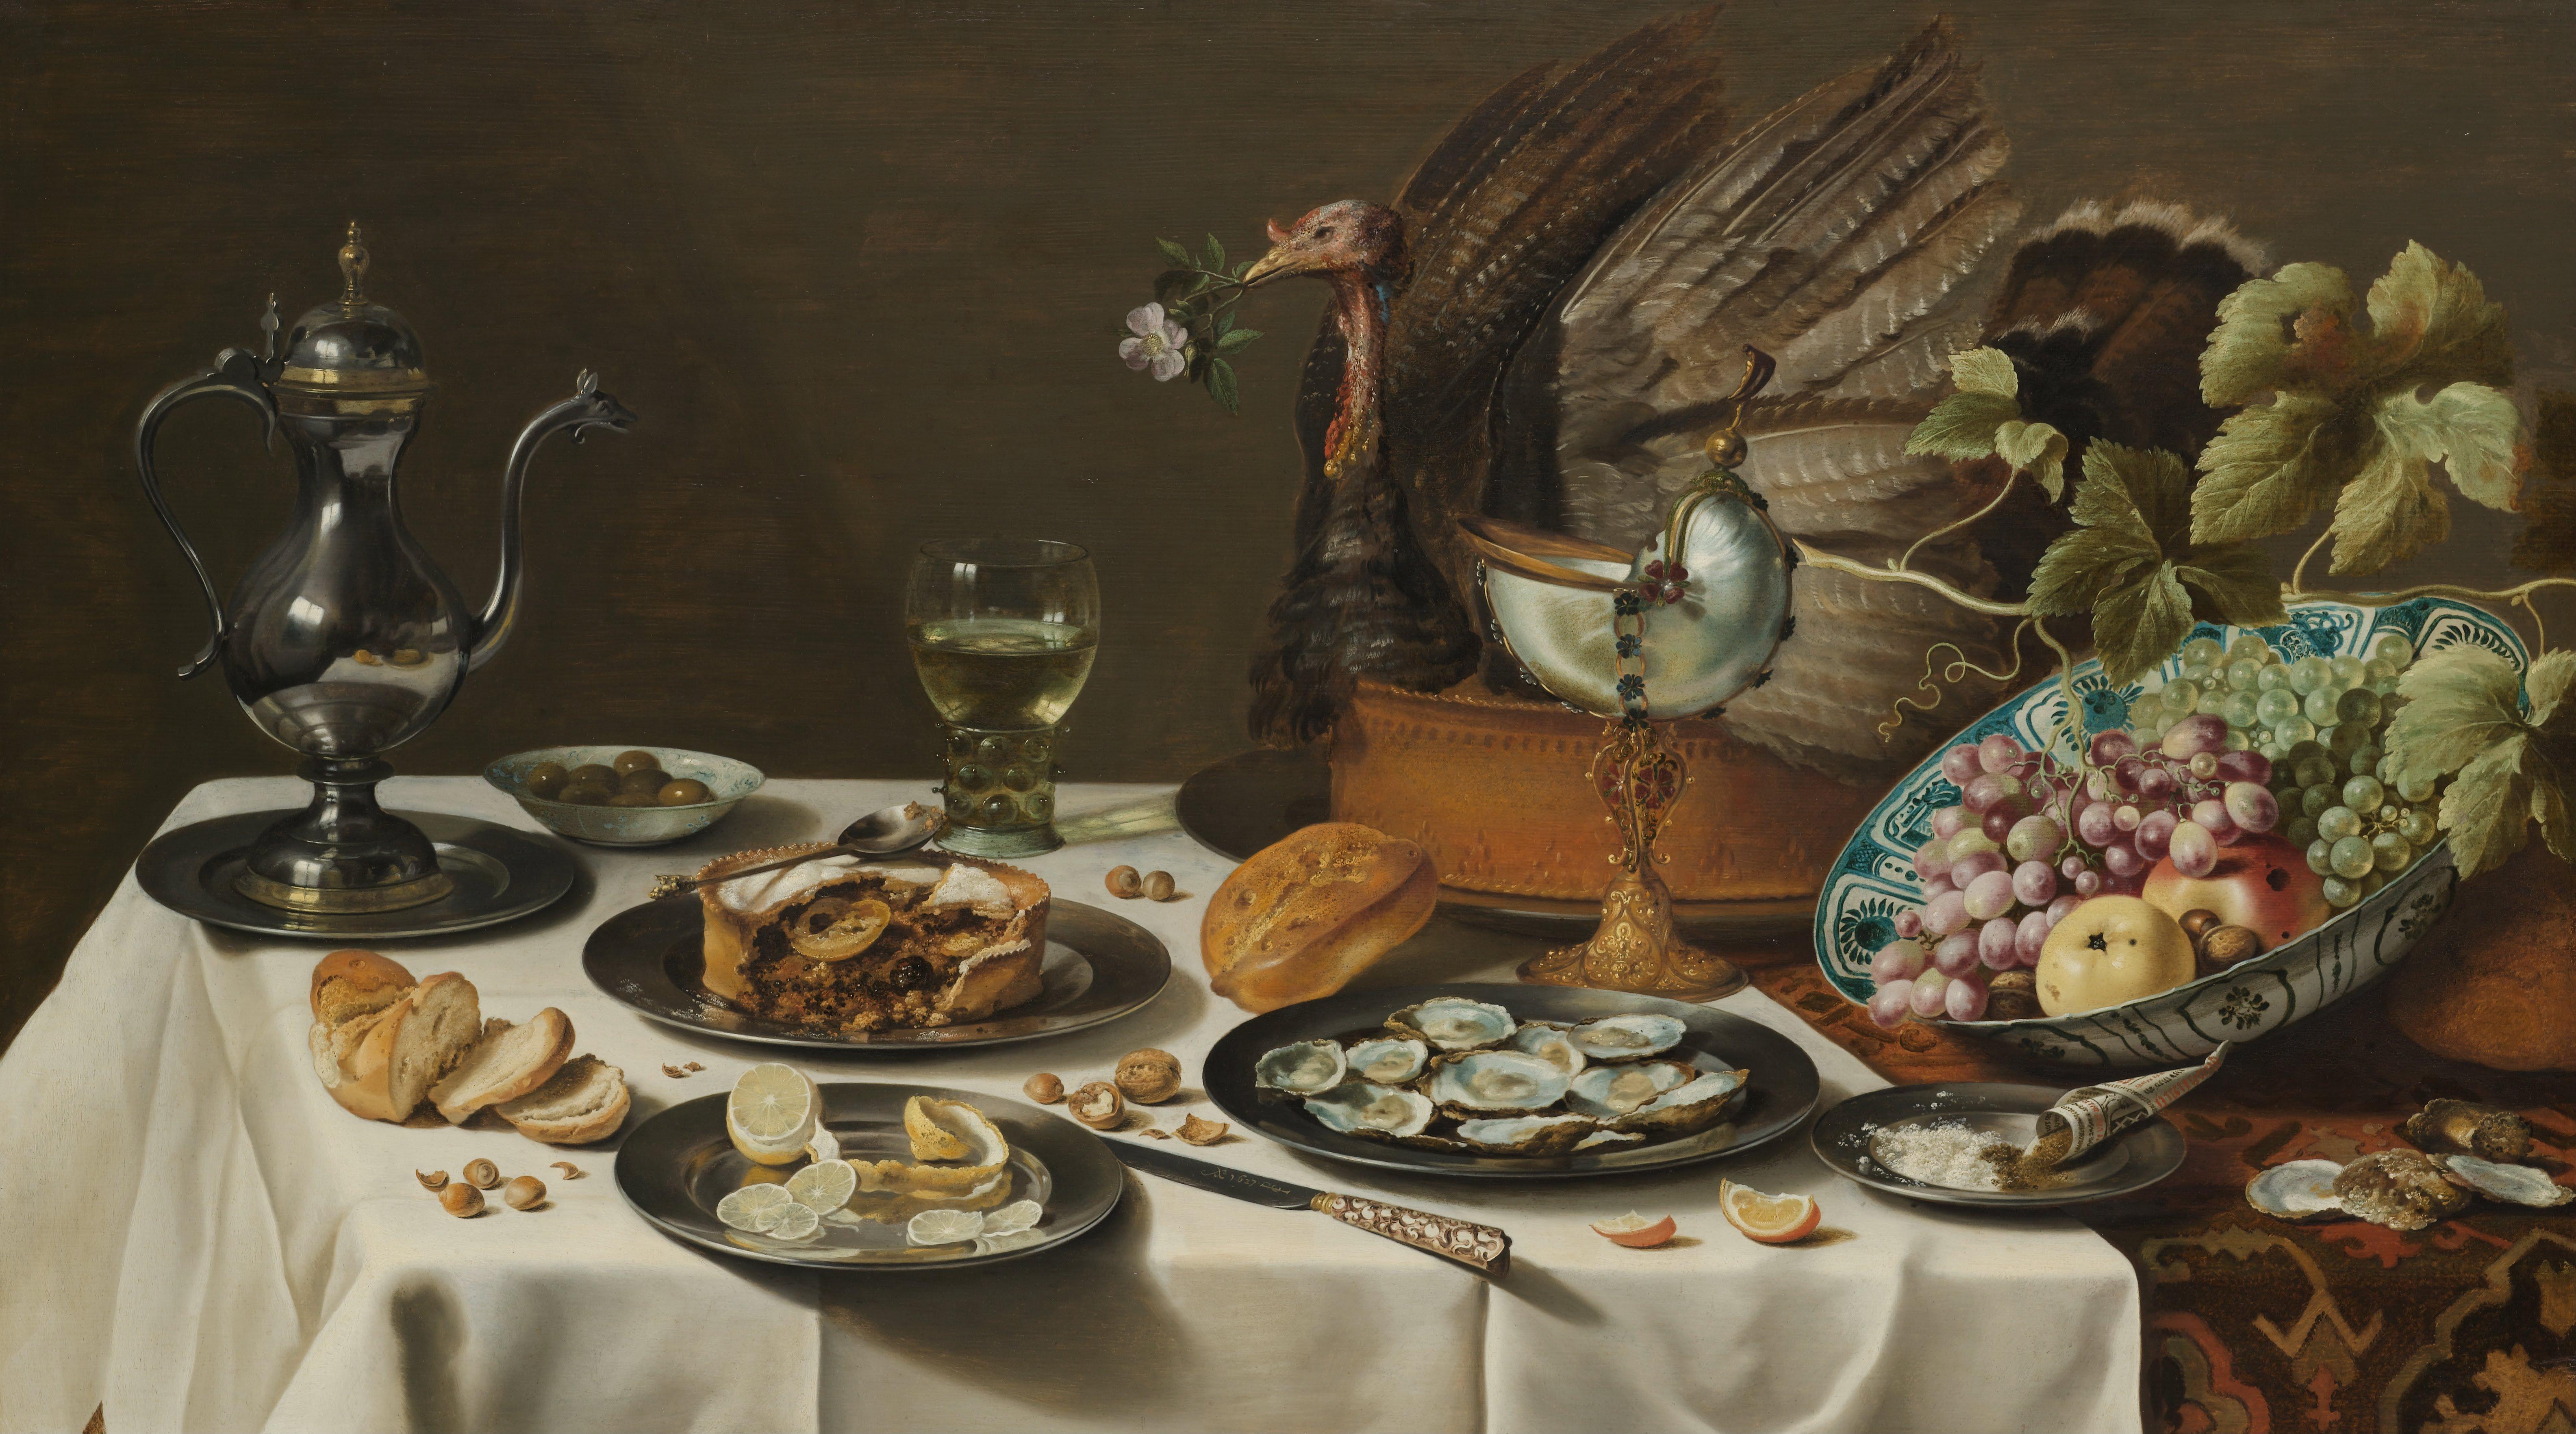 Claesz, Pieter_Still Life with a Turkey Pie